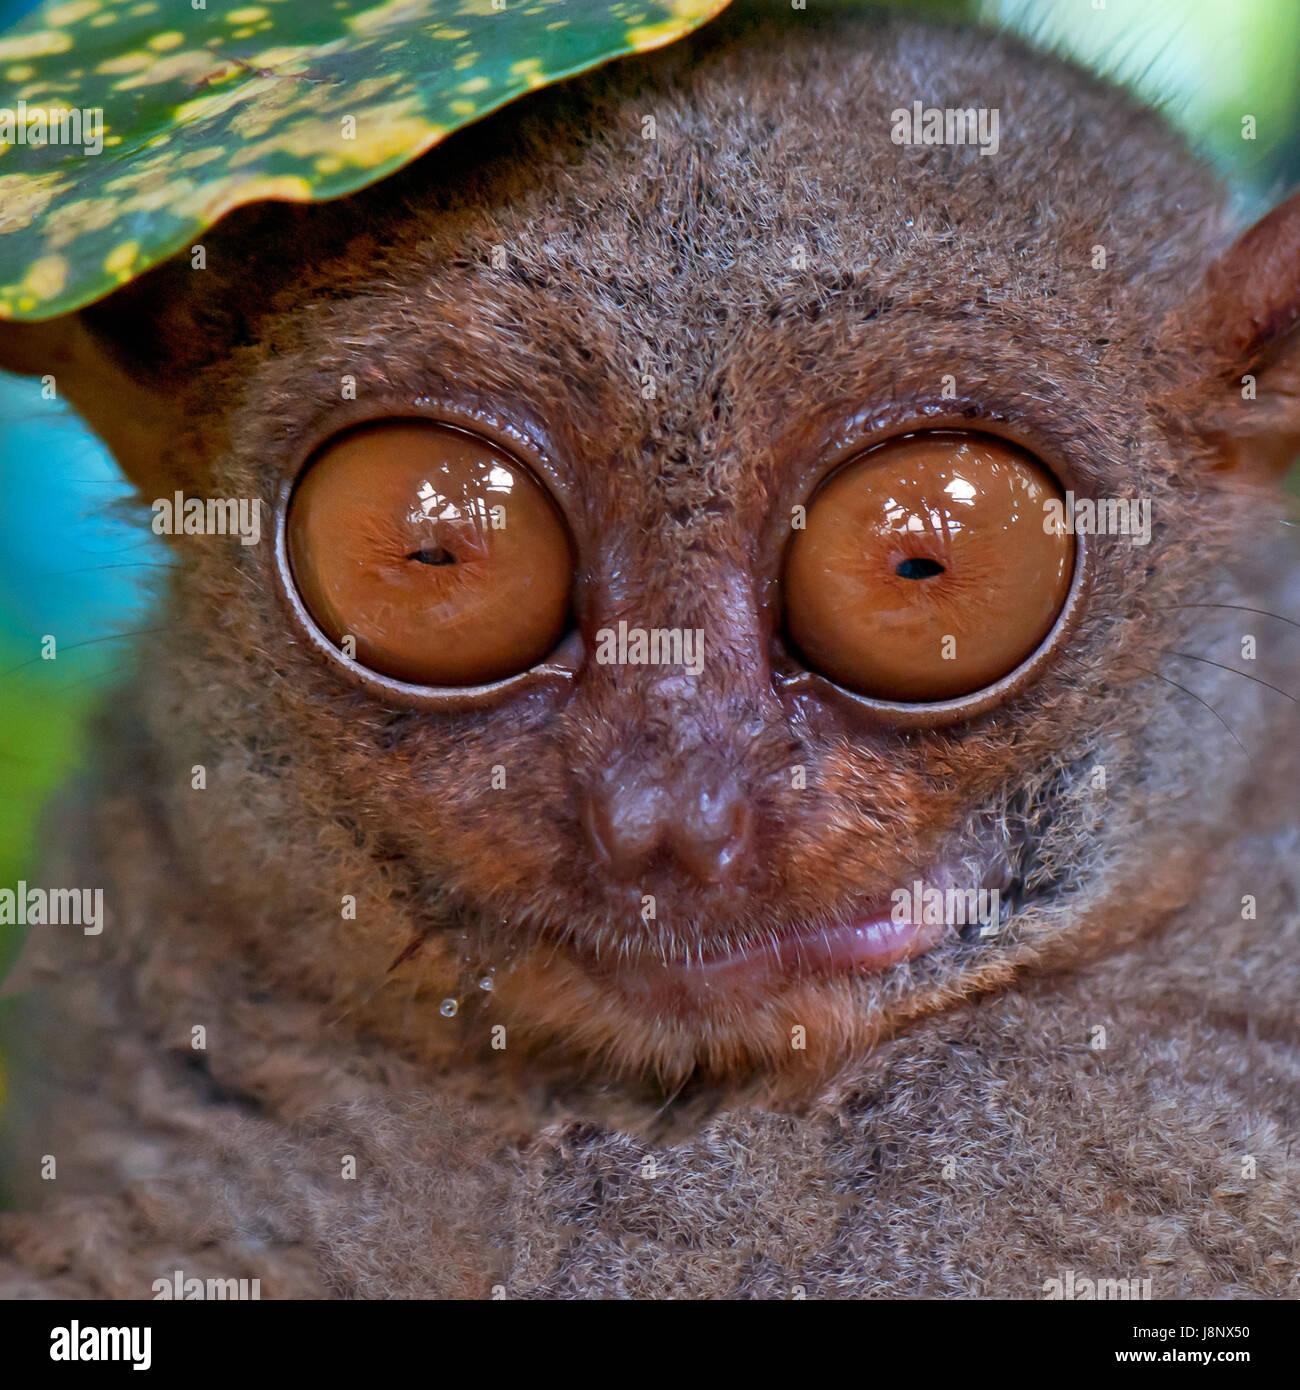 Animal, sauvage, singe, drôle, doigt, voyage, gros, grand, énorme, extrême Photo Stock - Alamy